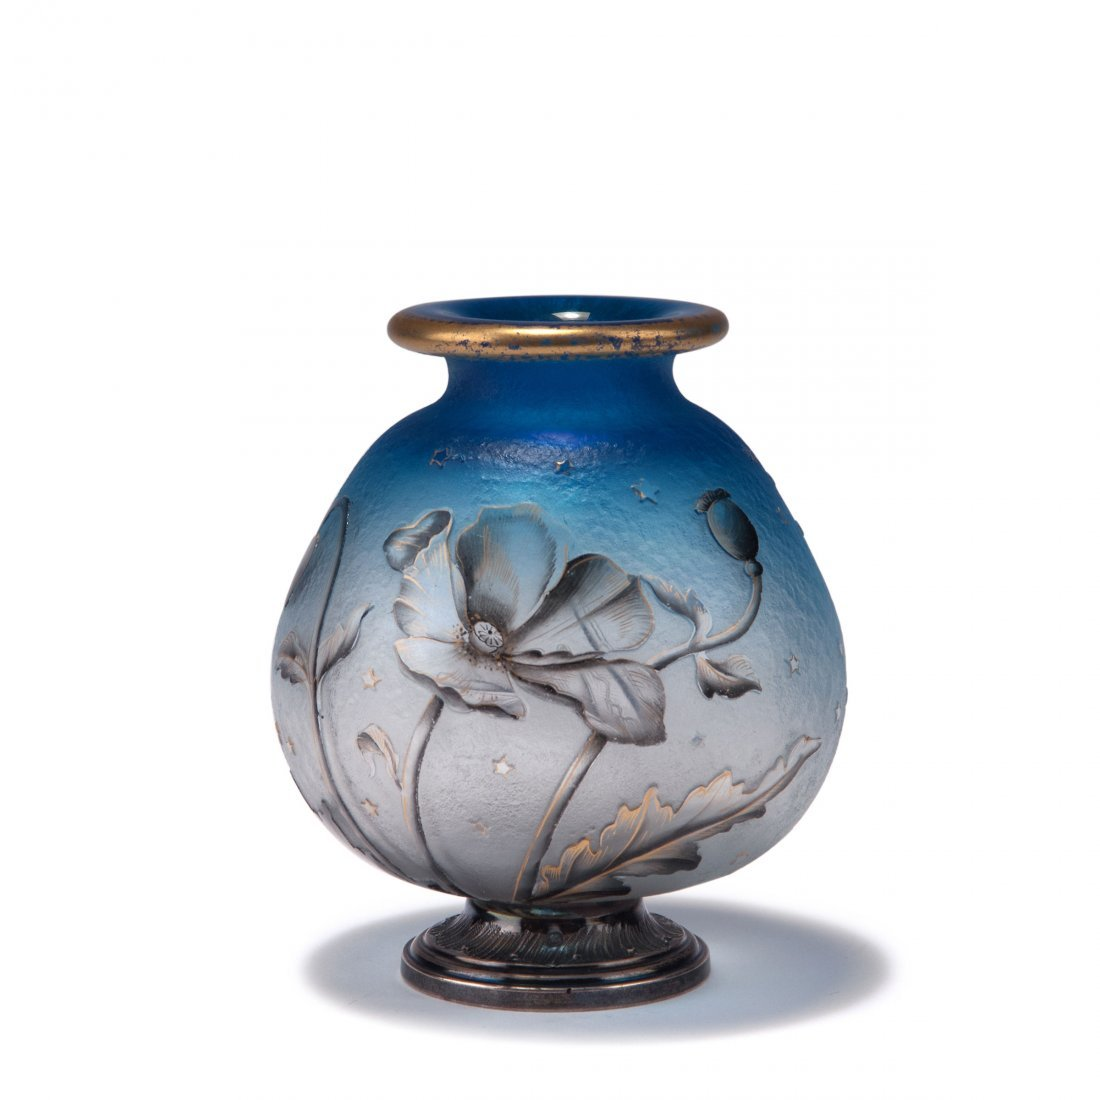 'Pavots' vase, c1895